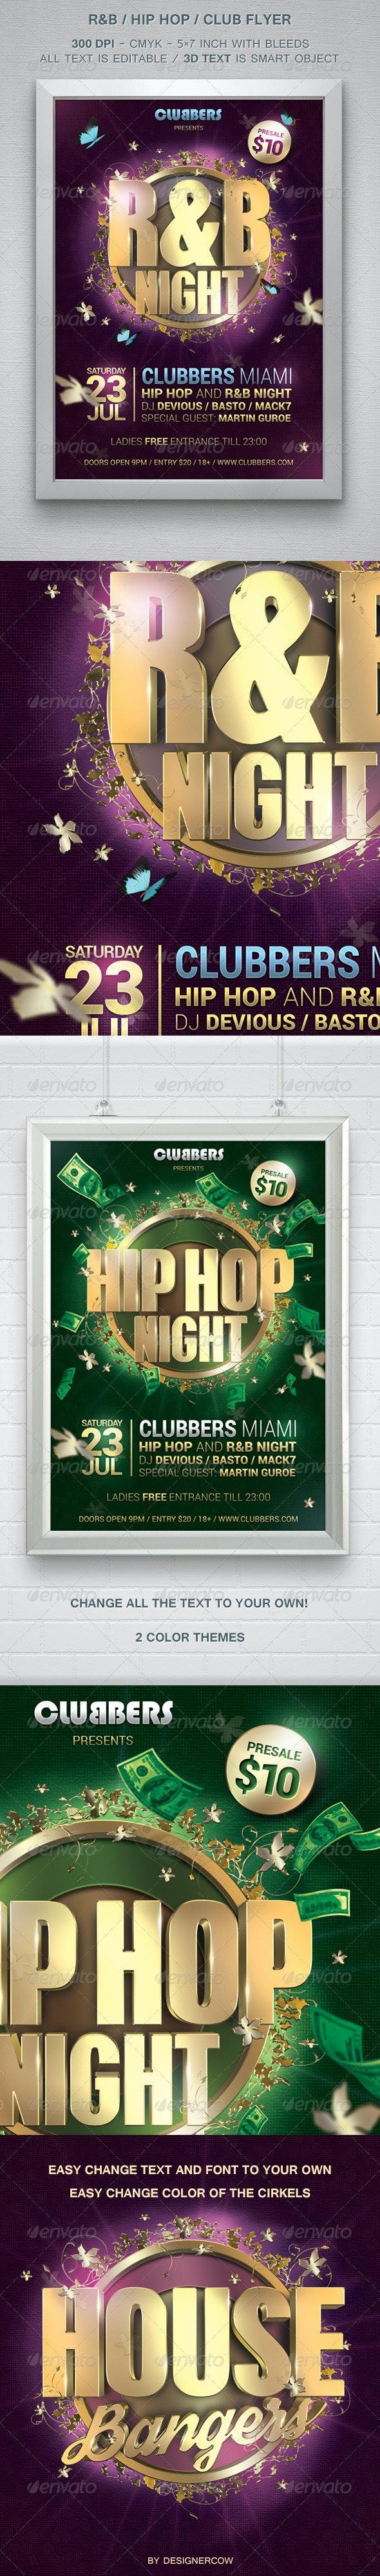 R&B Hip Hop Club Flyer - Flyers Print Templates